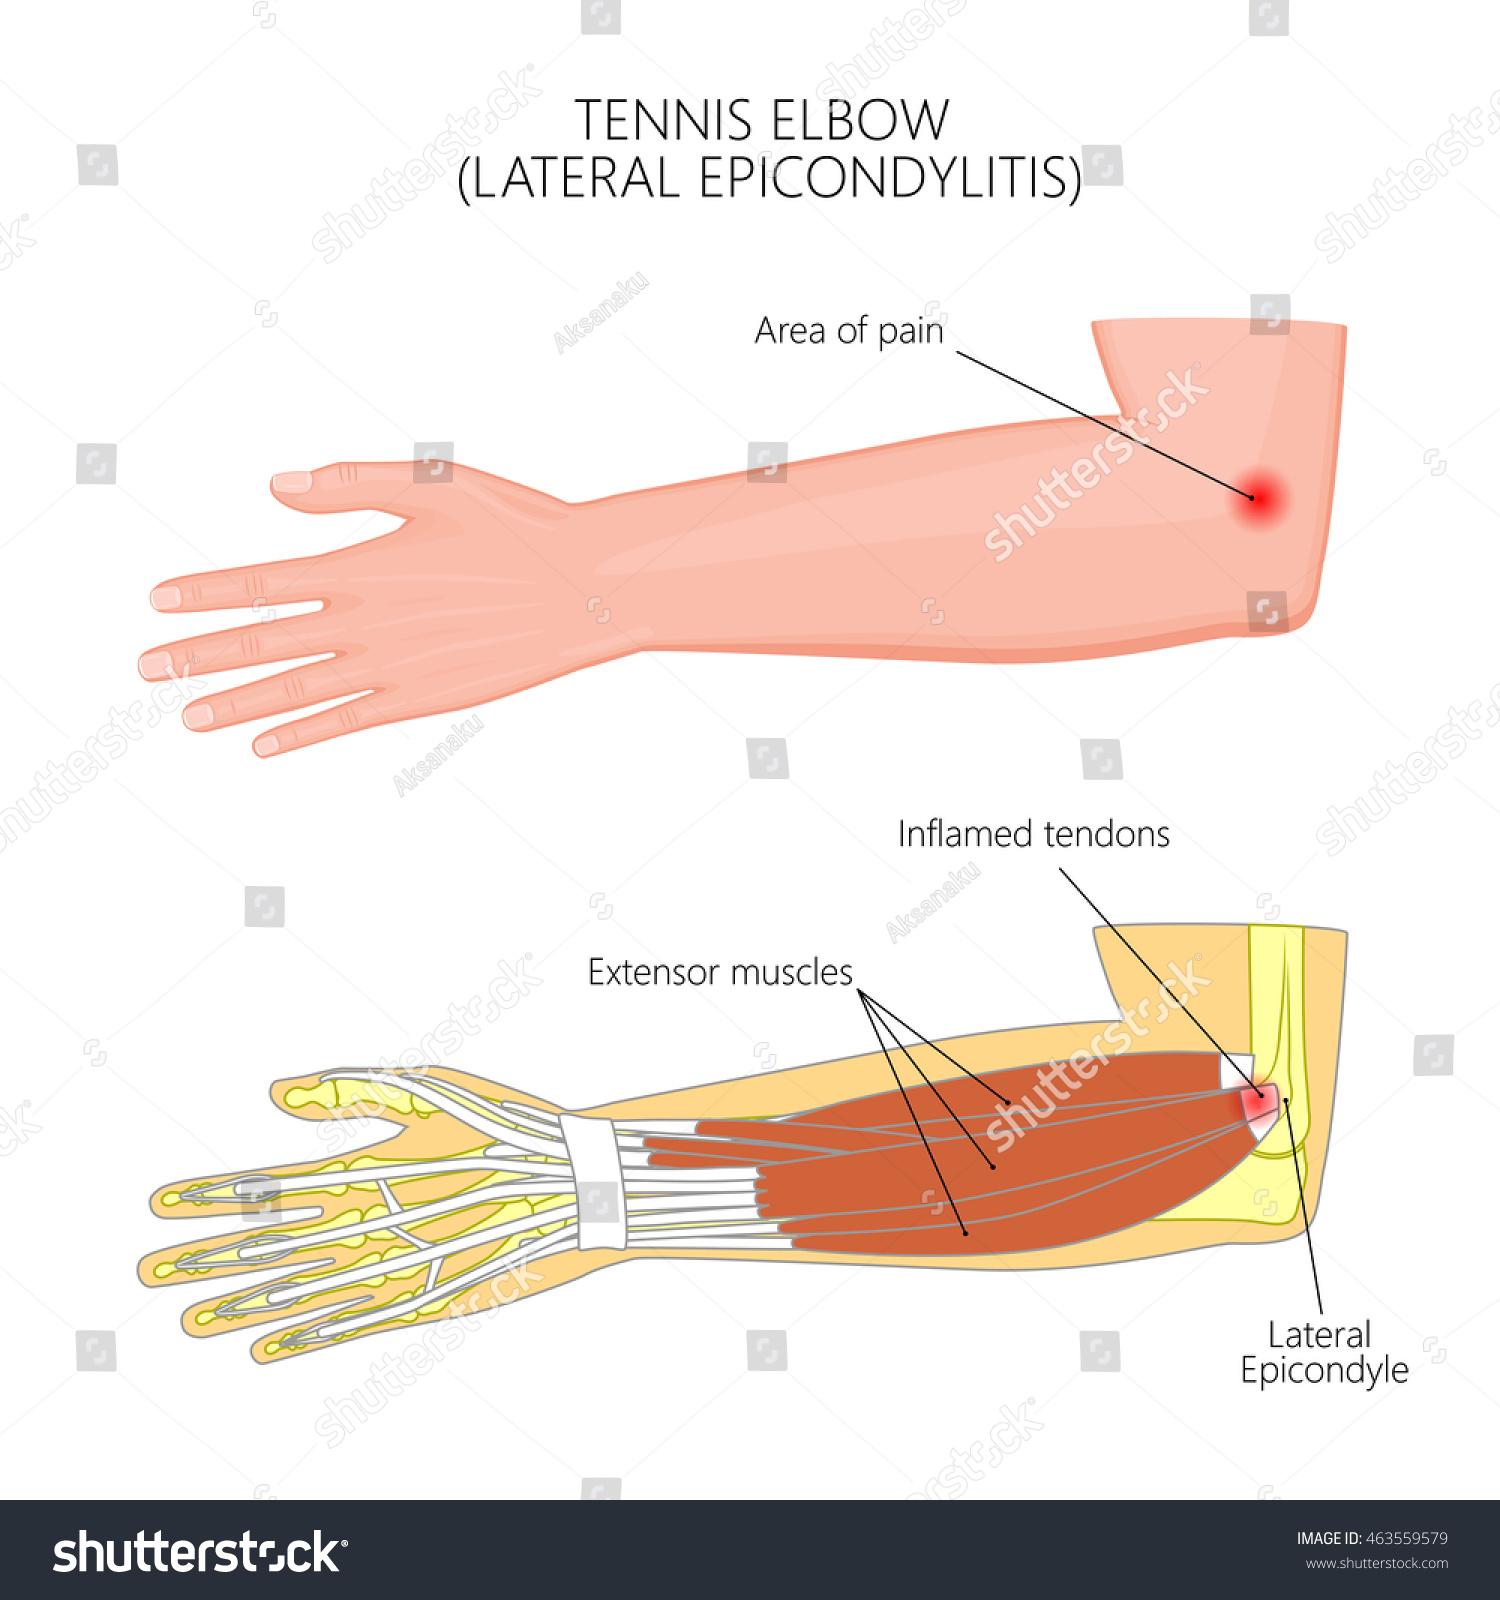 Vector Illustration Lateral Epicondylitis Tennis Elbow Stock Vector ...